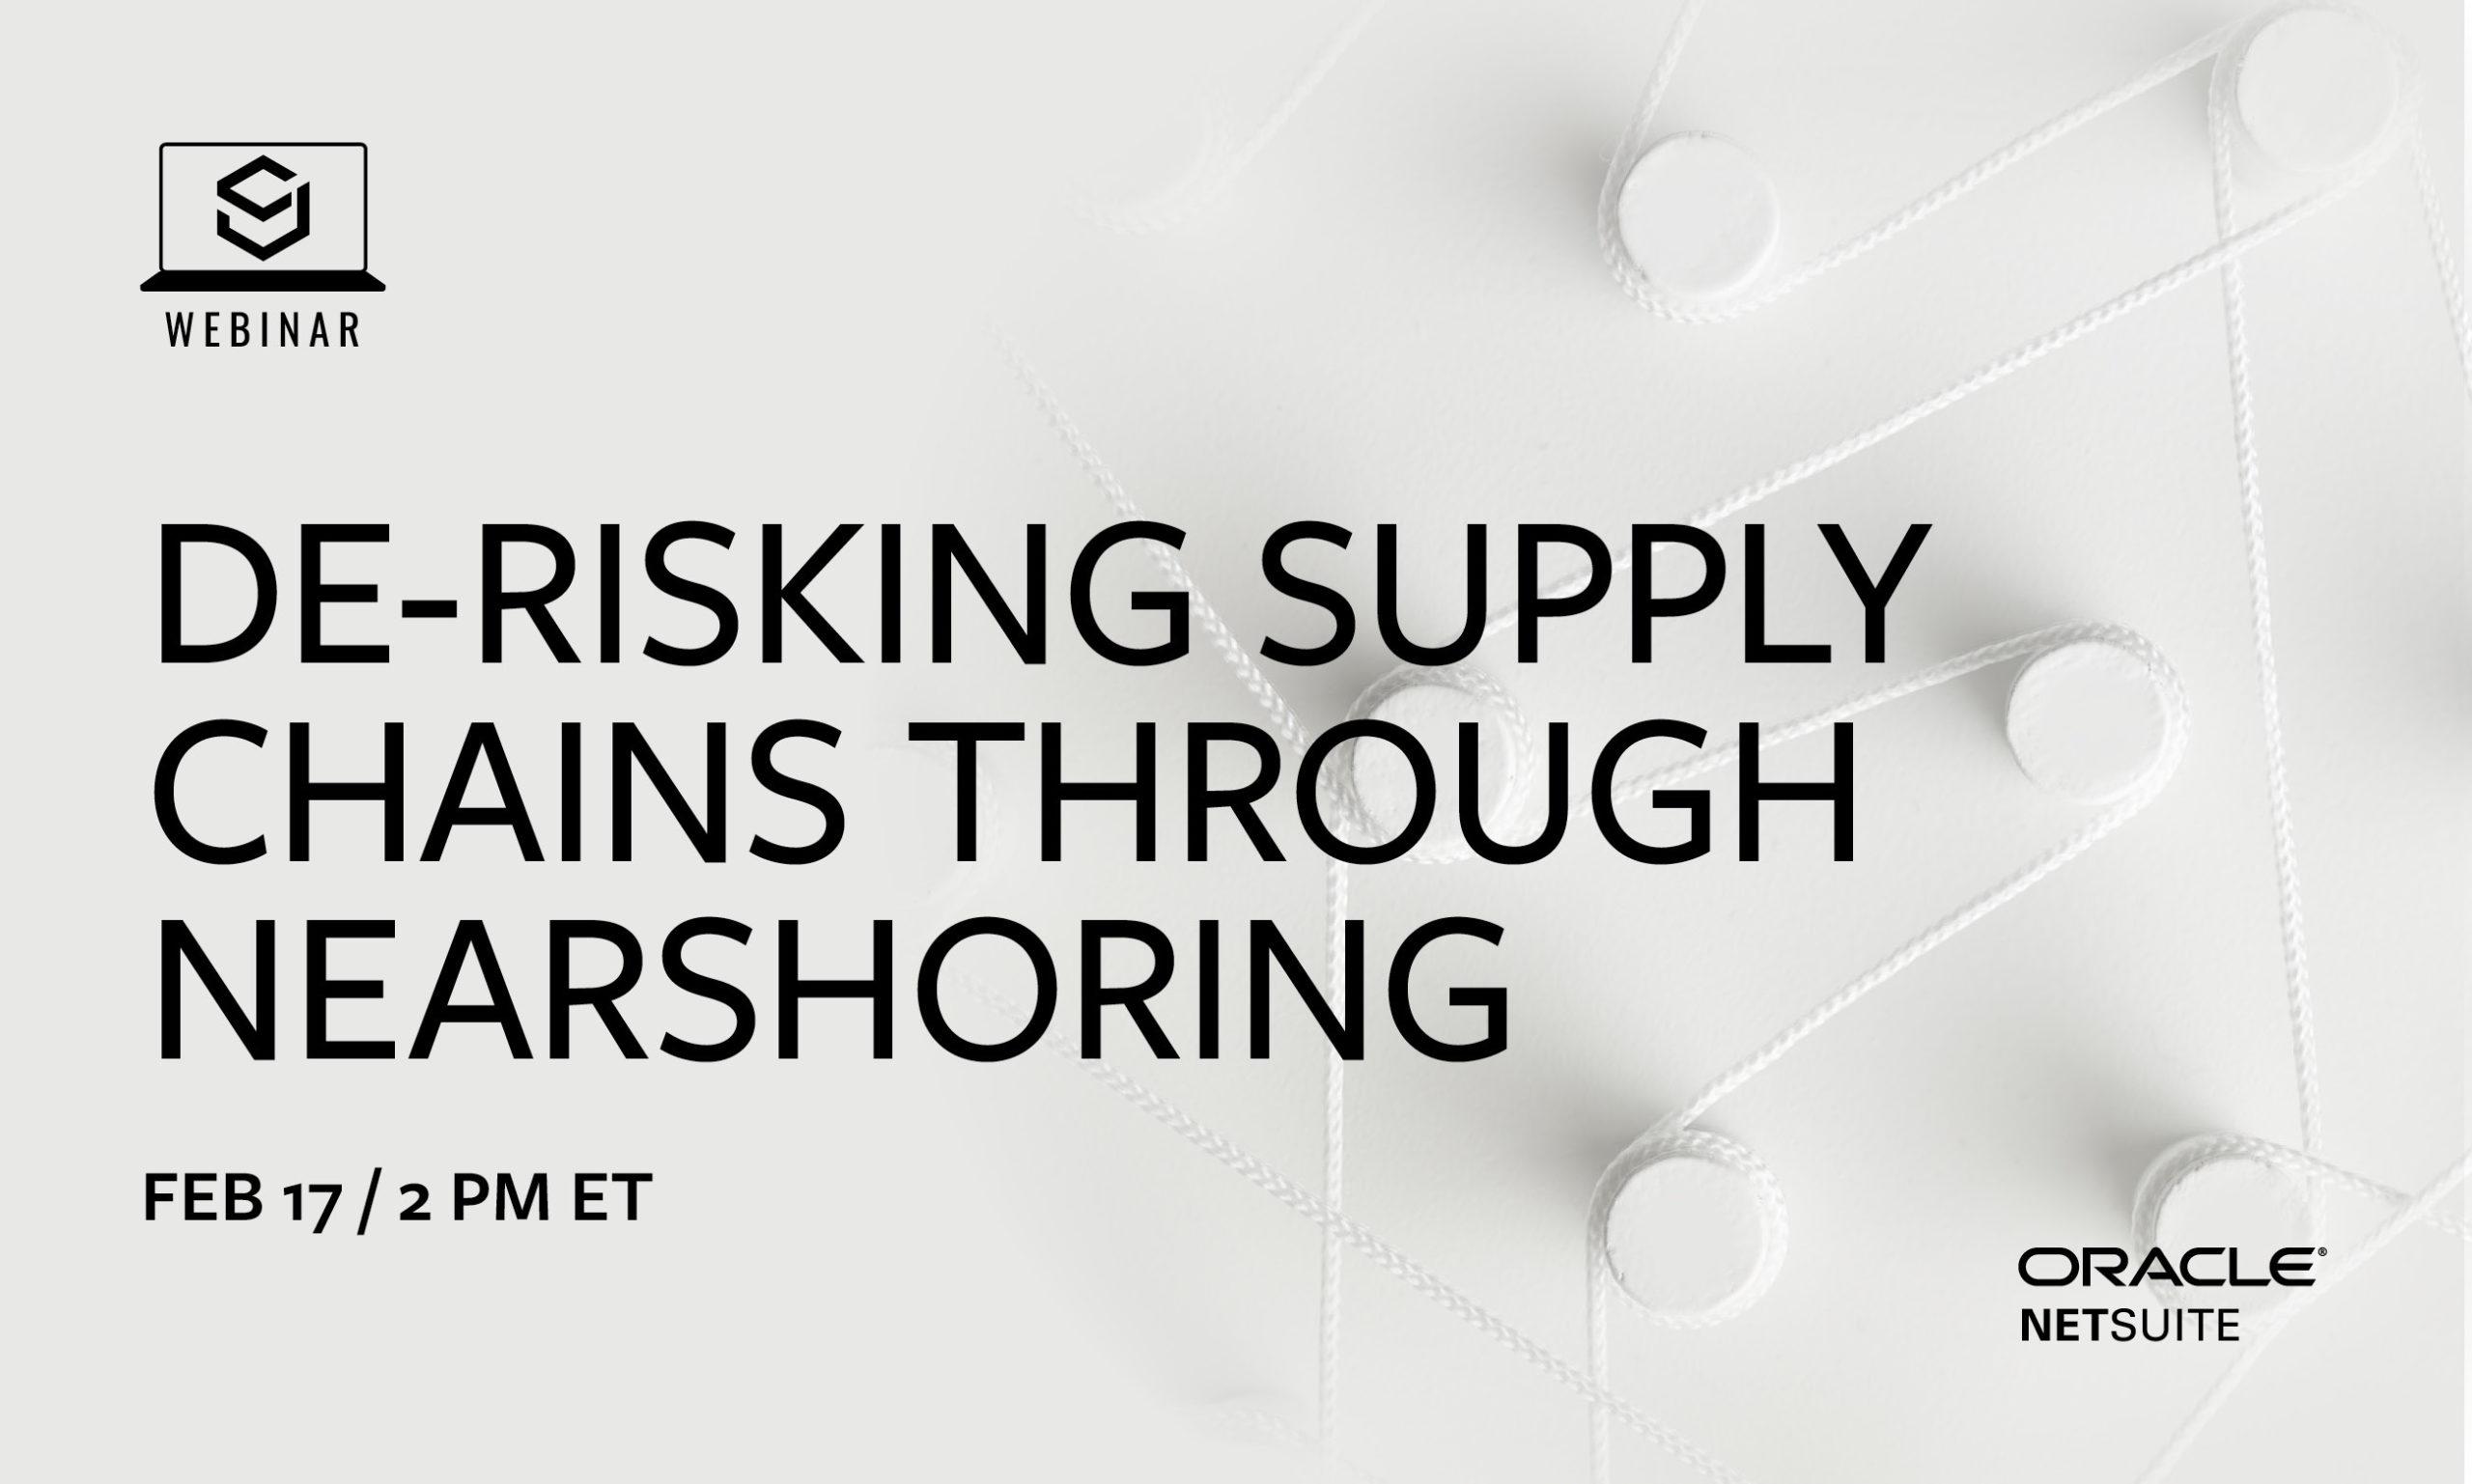 De-Risking Supply Chains Through Nearshoring